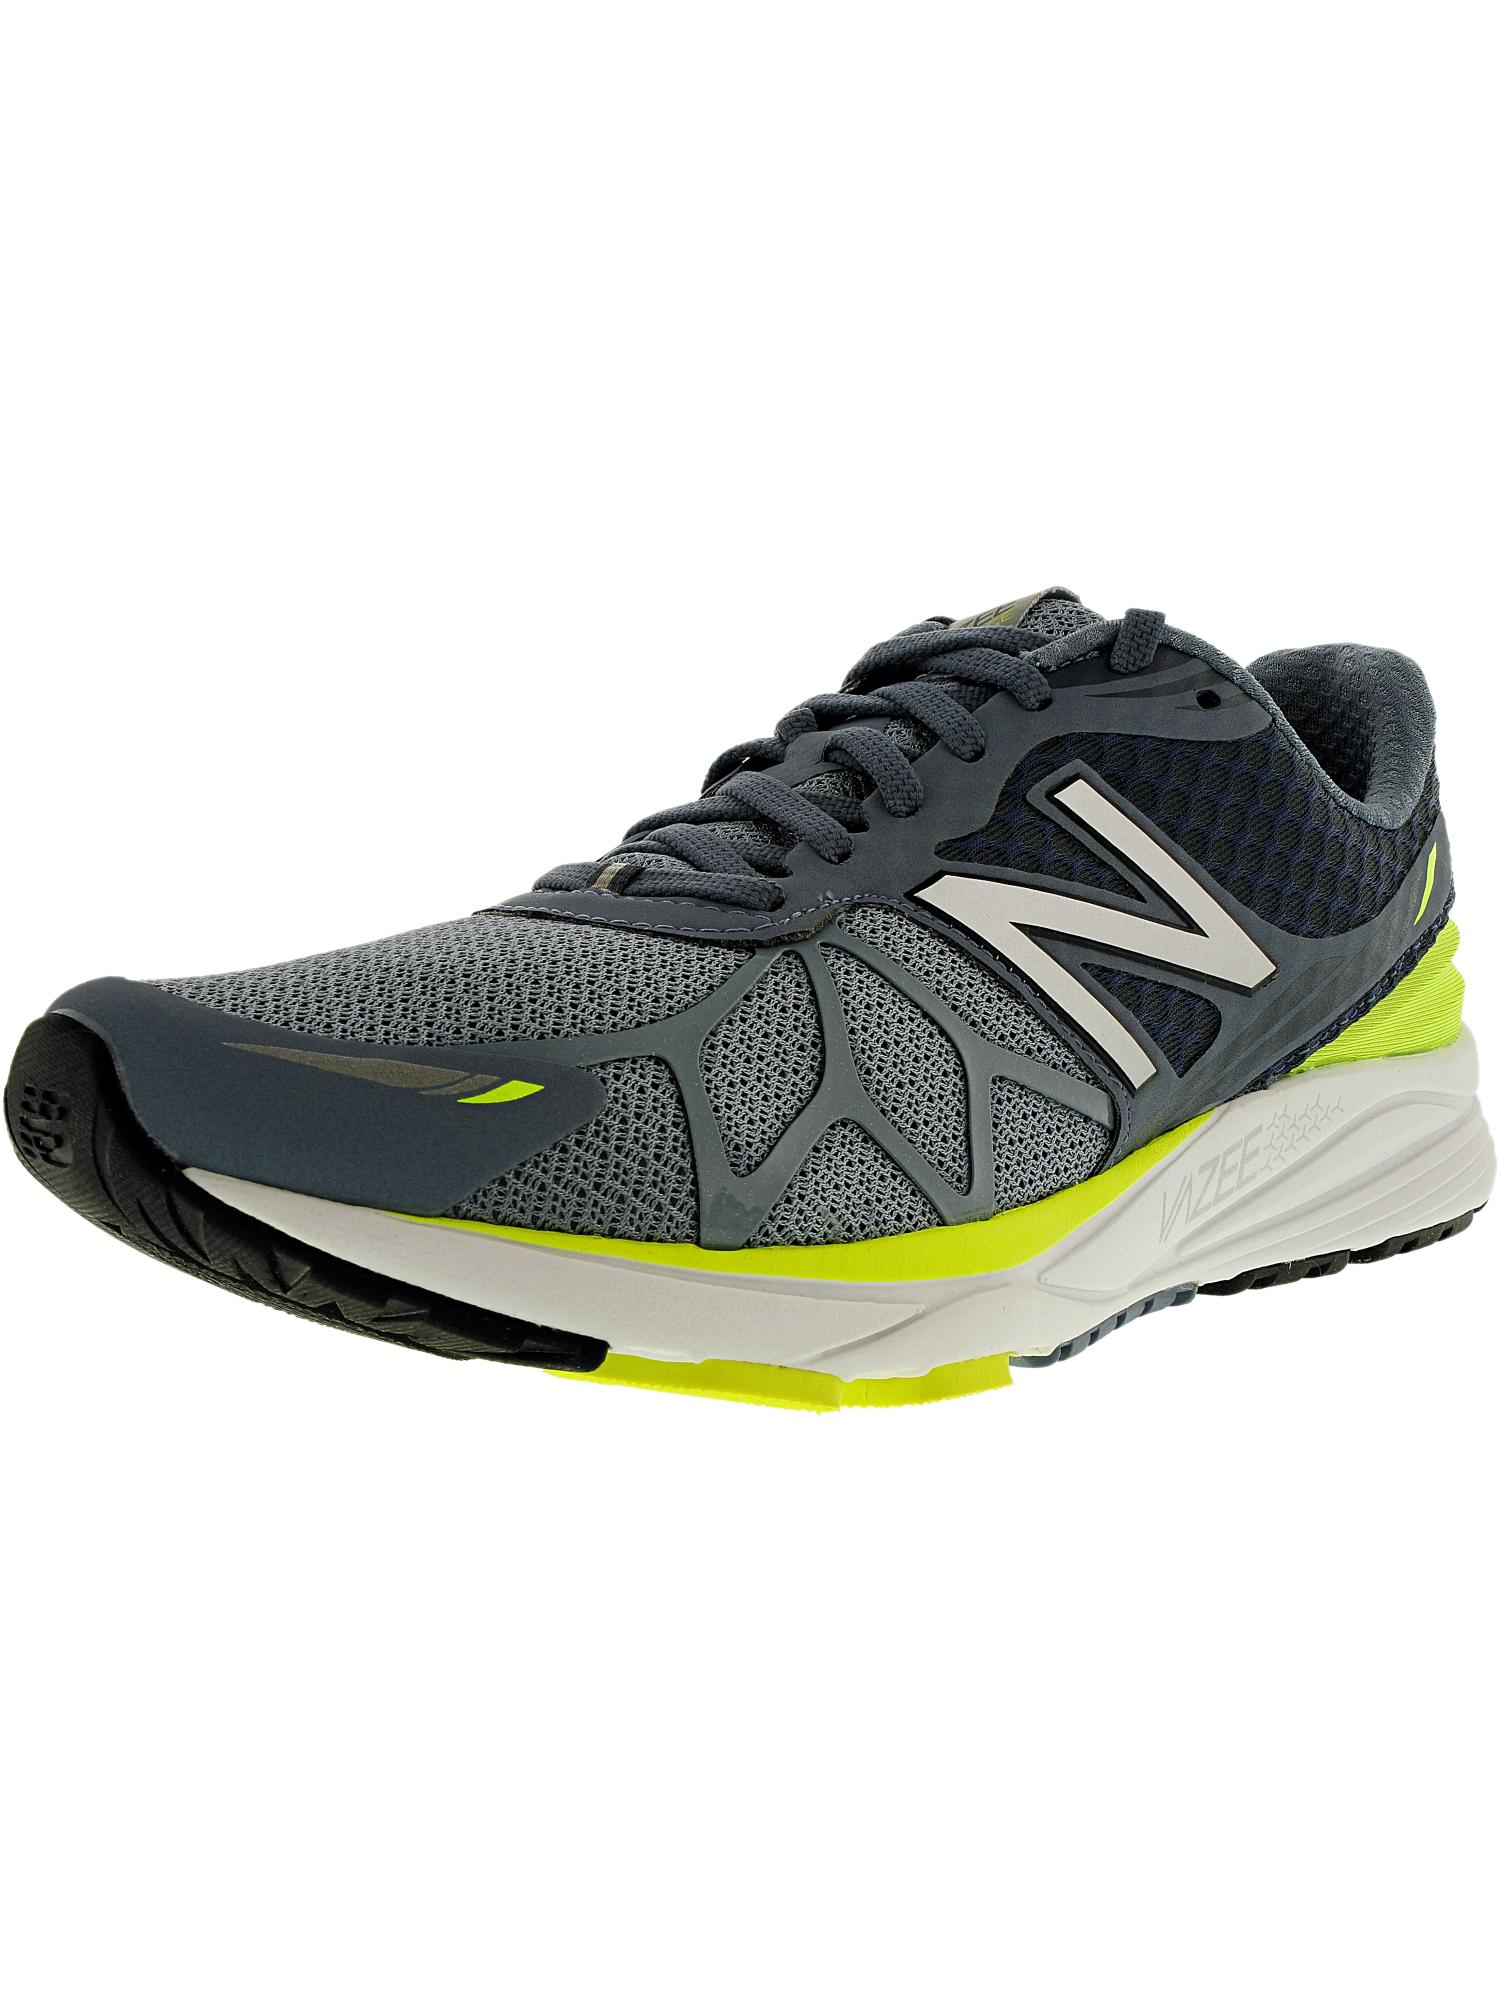 2e14a61b389 ... New Balance Balance Balance Men s Mpace Ankle-High Running Shoe f024a2  ...